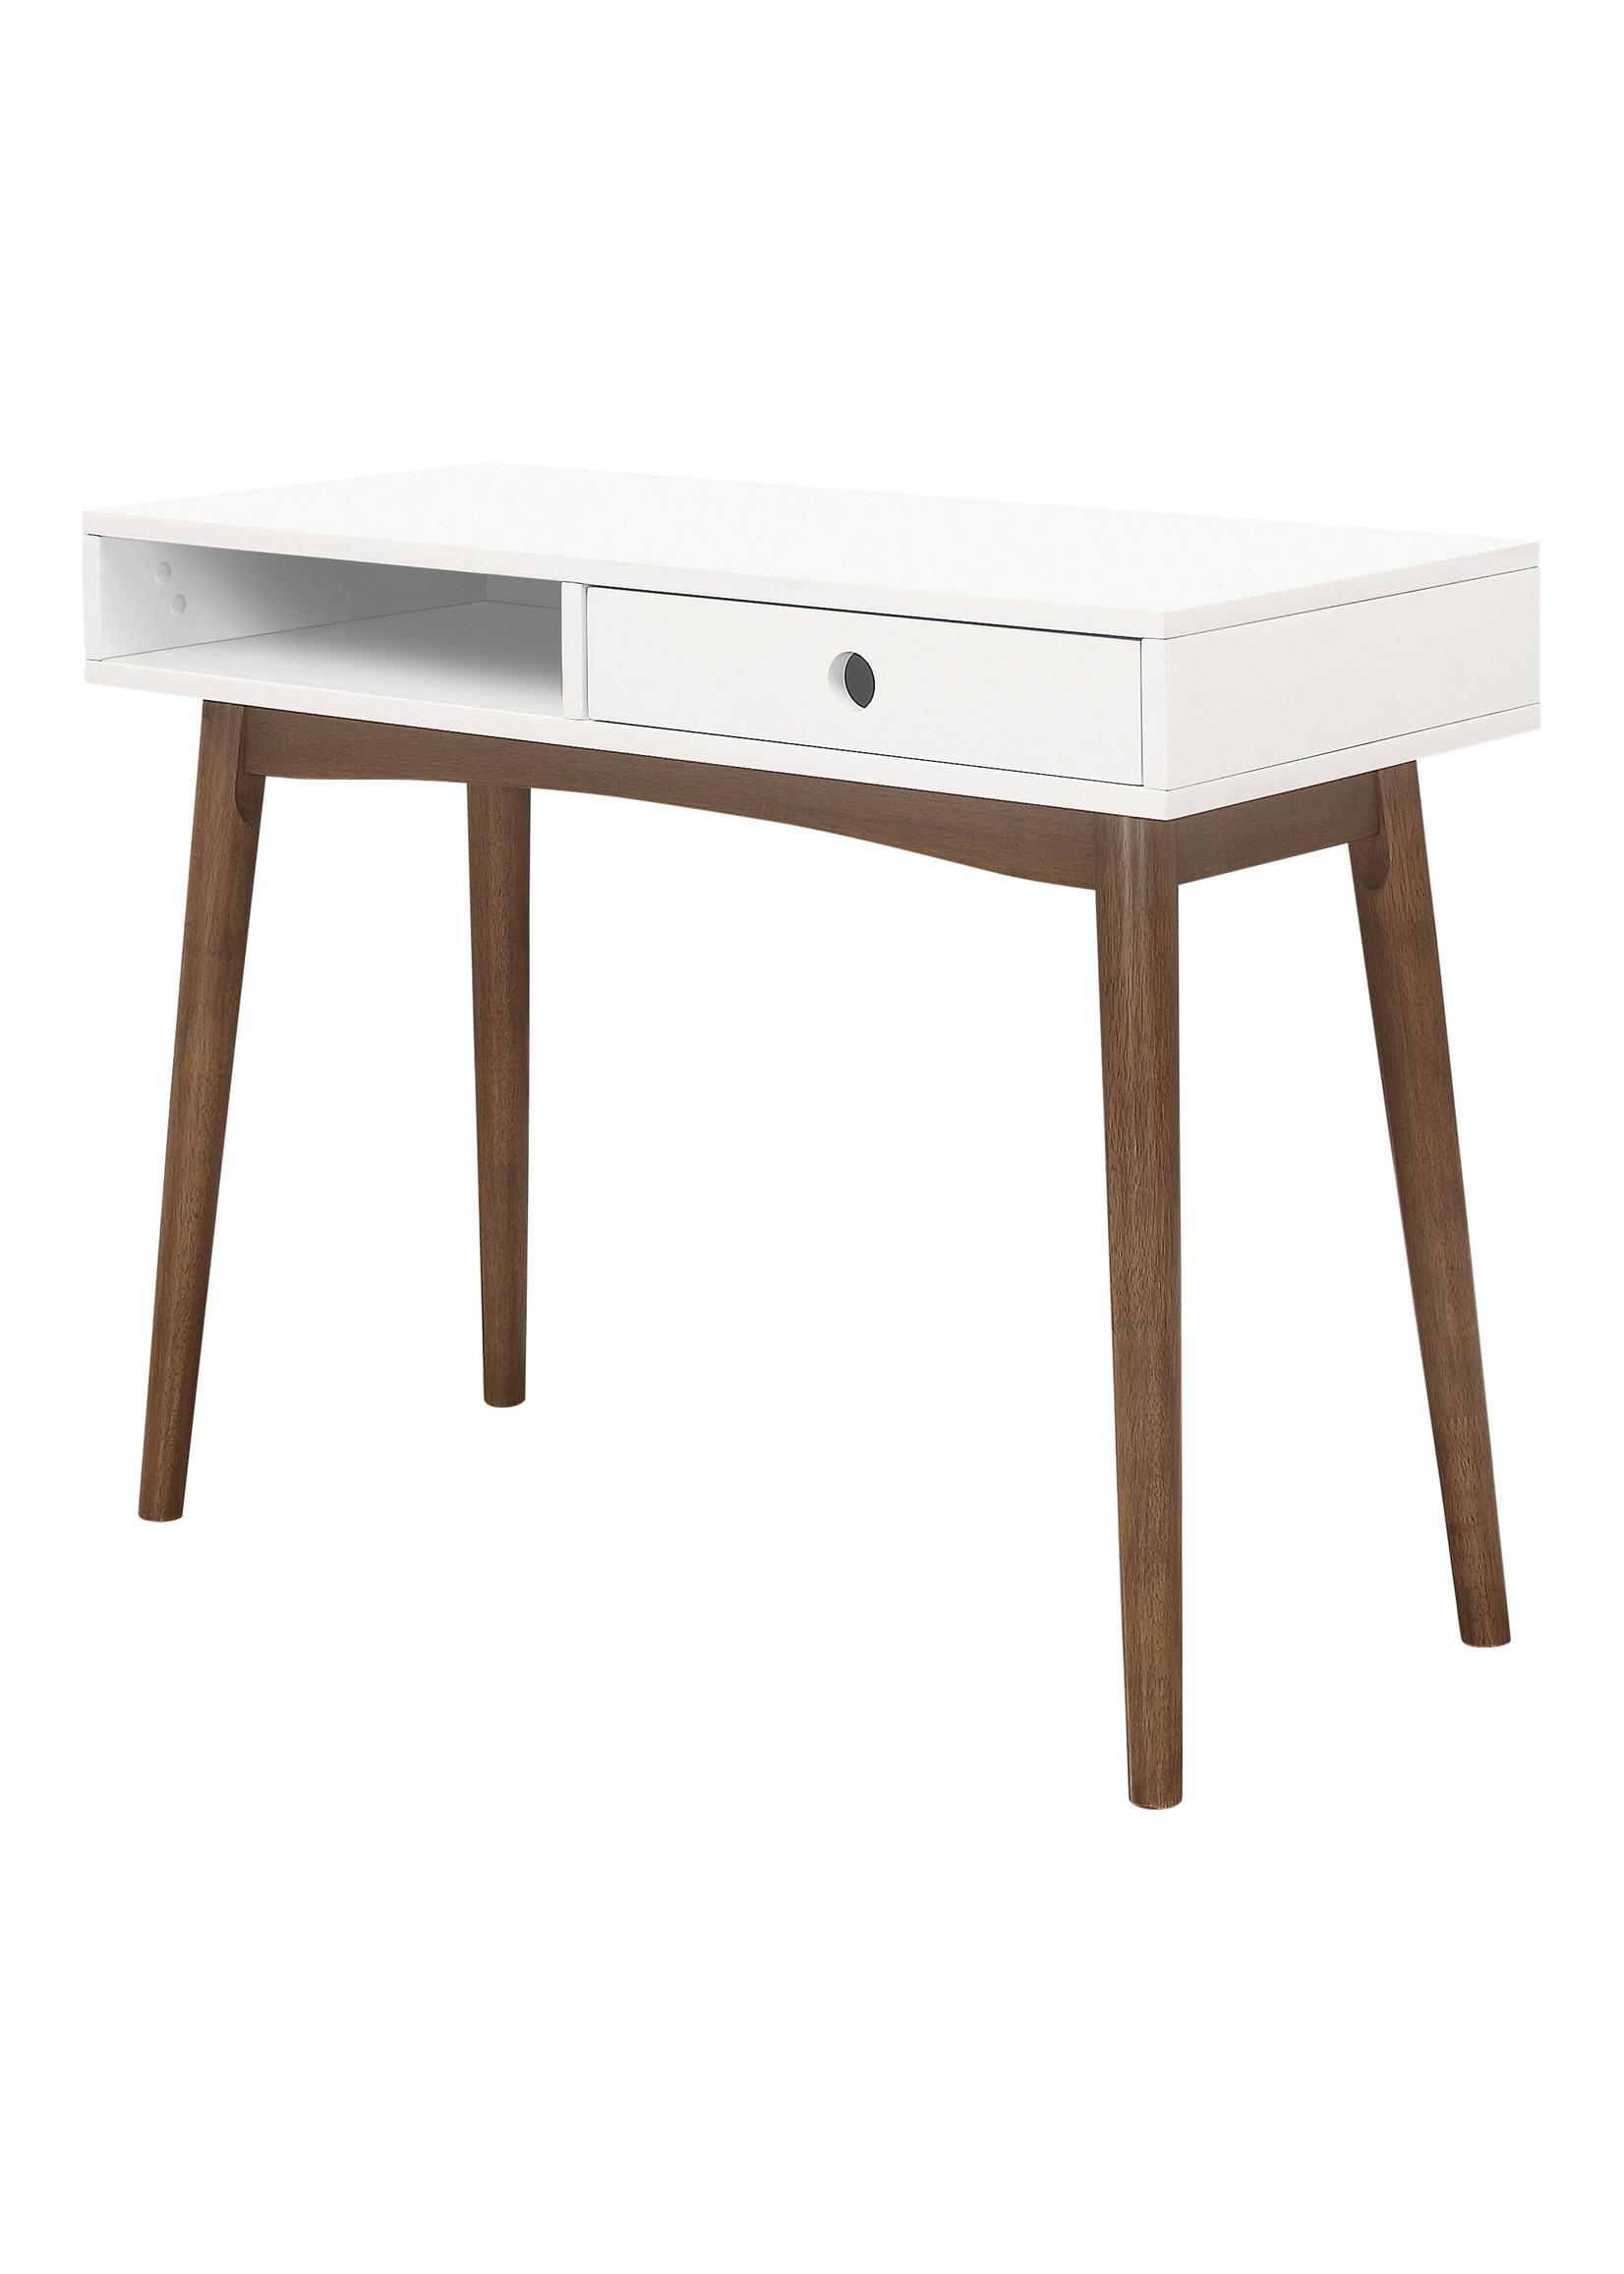 Coaster Furniture Writing Desk White Walnut by COASTER